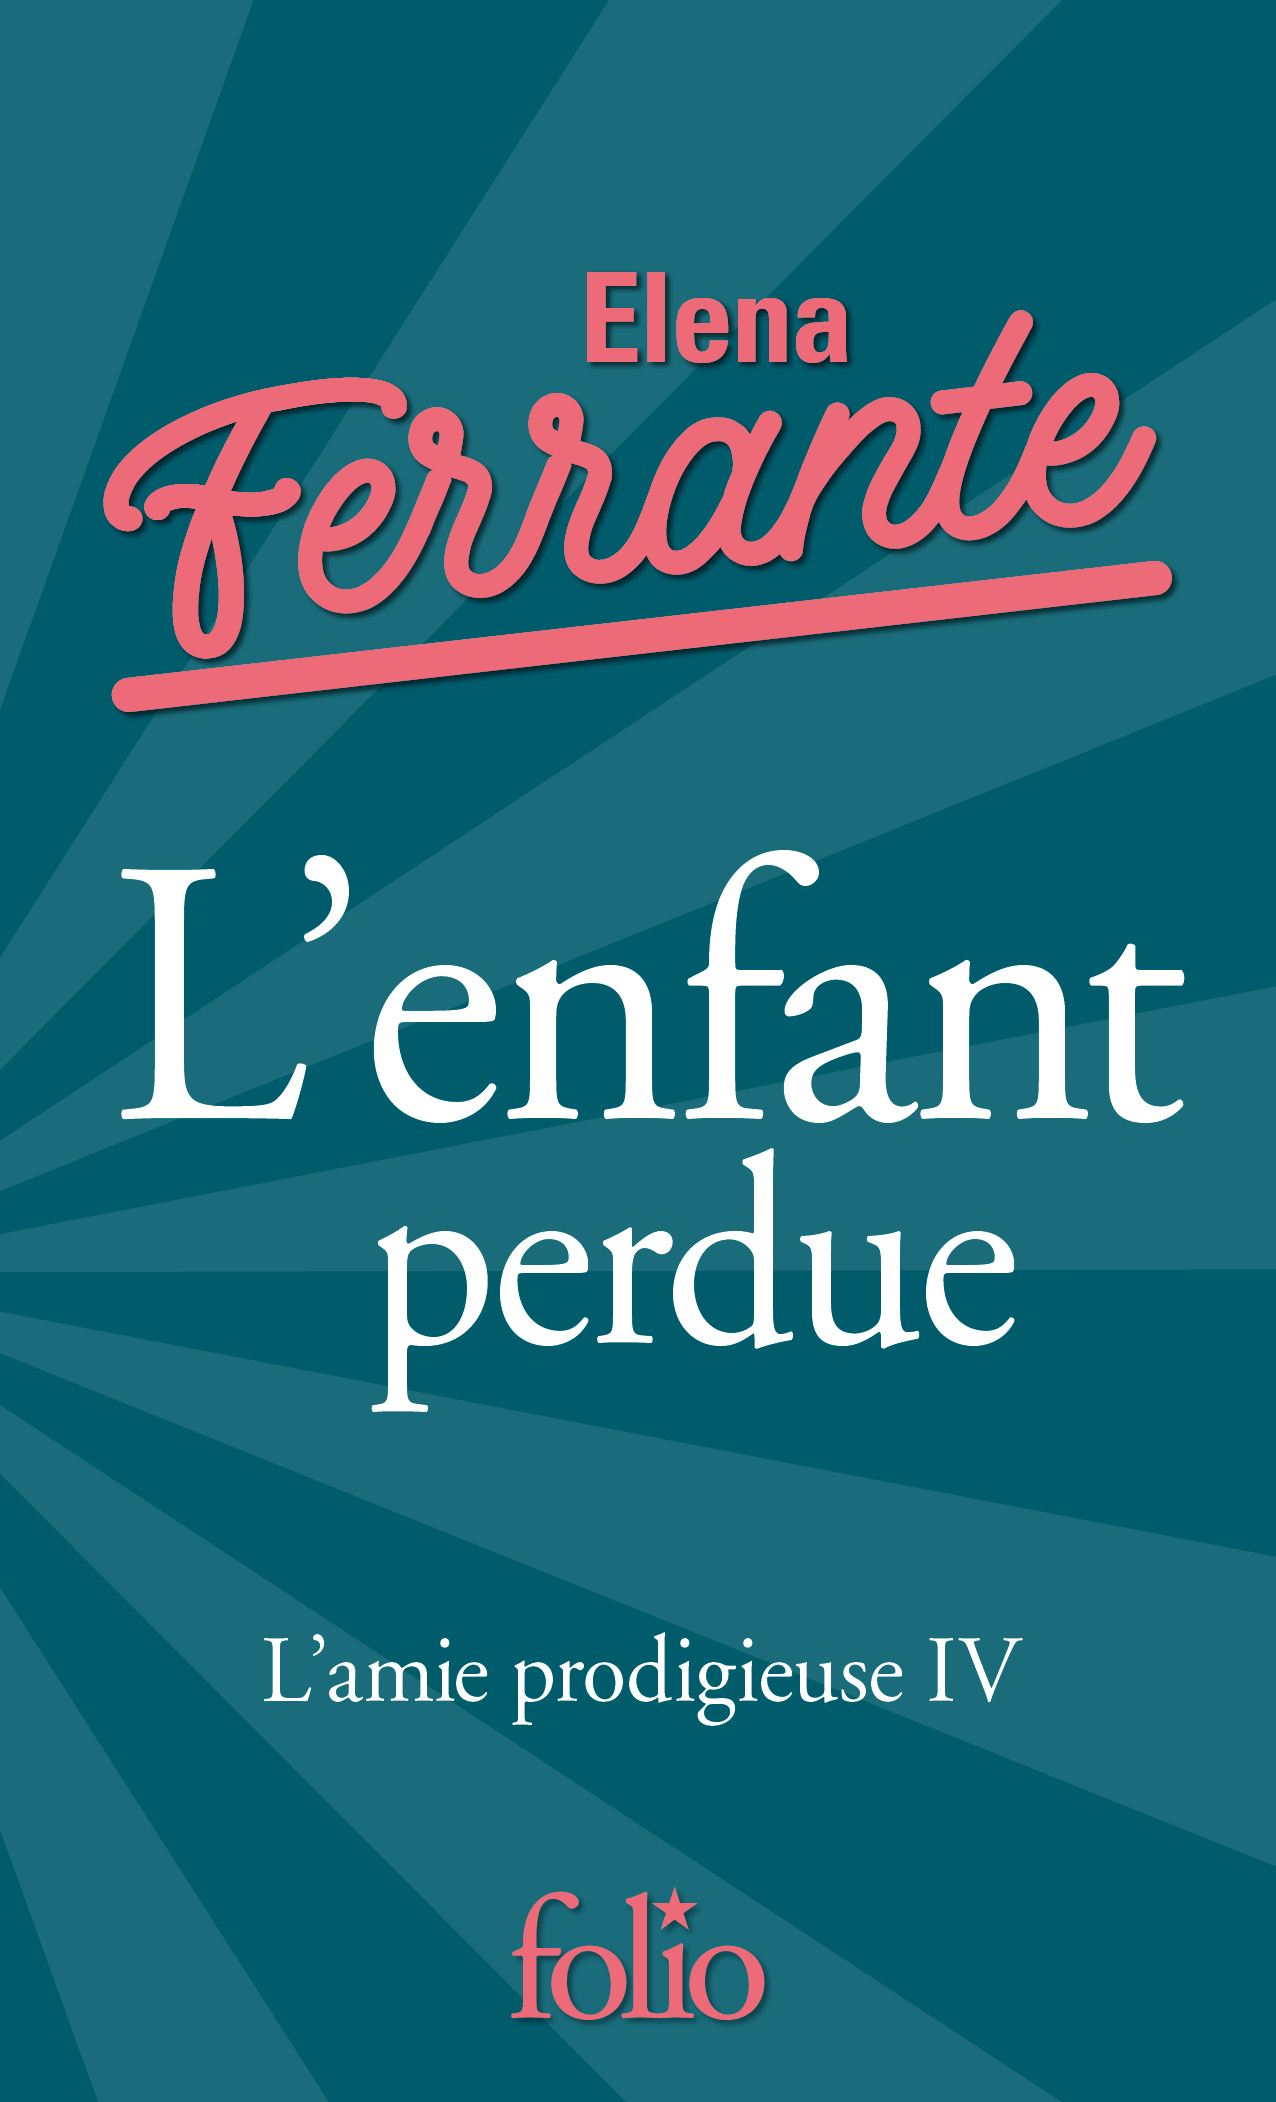 L'AMIE PRODIGIEUSE, IV : L'ENFANT PERDUE - L'AMIE PRODIGIEUSE IV